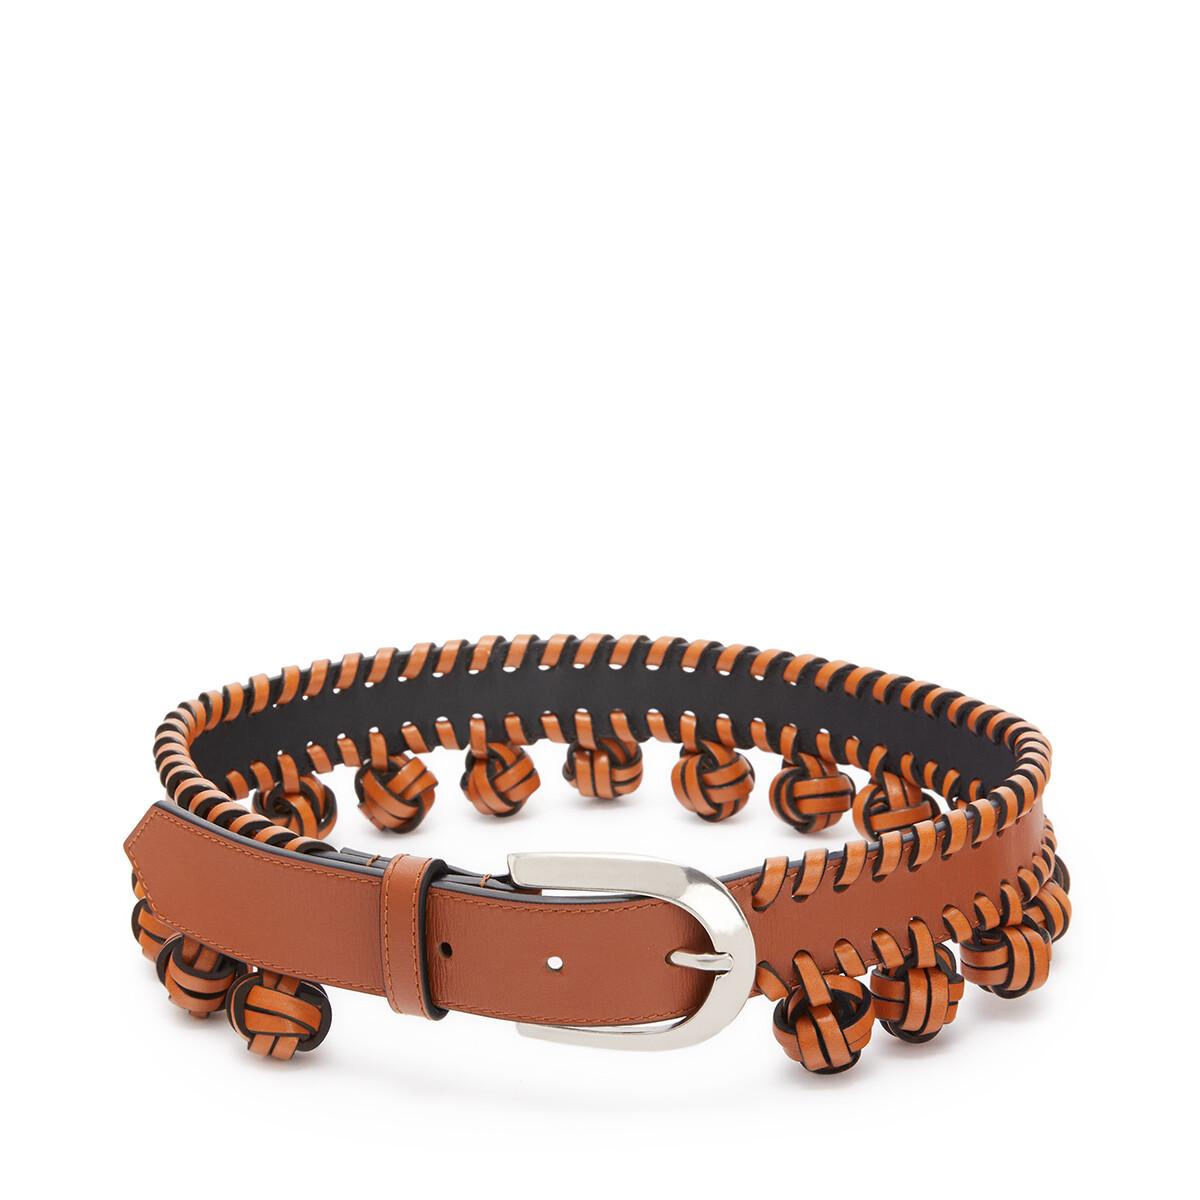 LOEWE Cinturon Nudo Bronceado/Paladio front